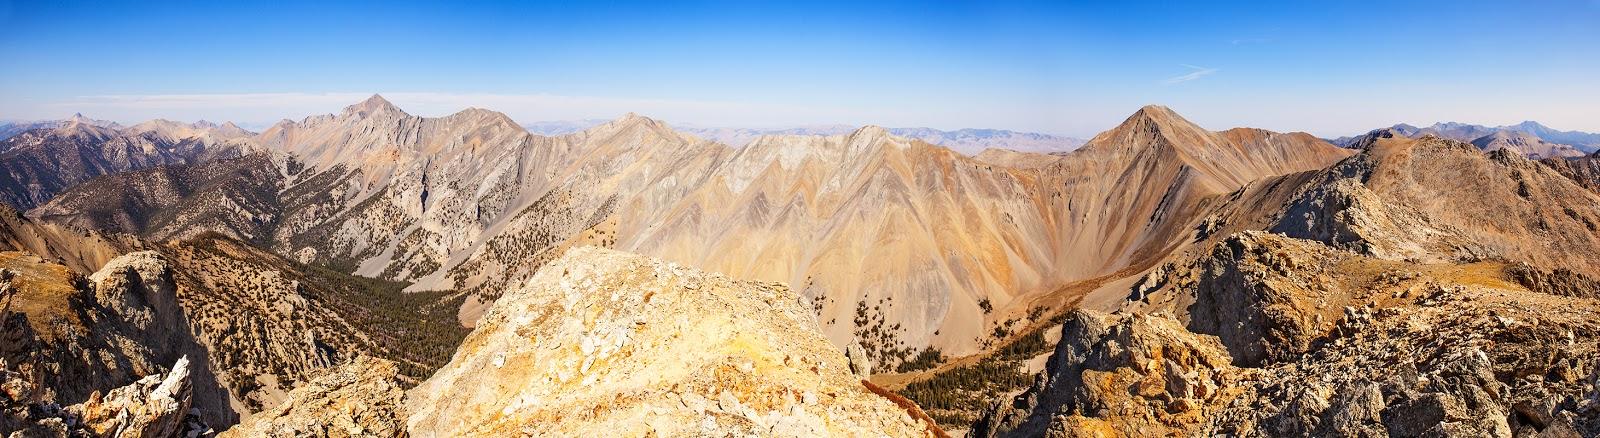 climbing Nicholson Peak, idaho